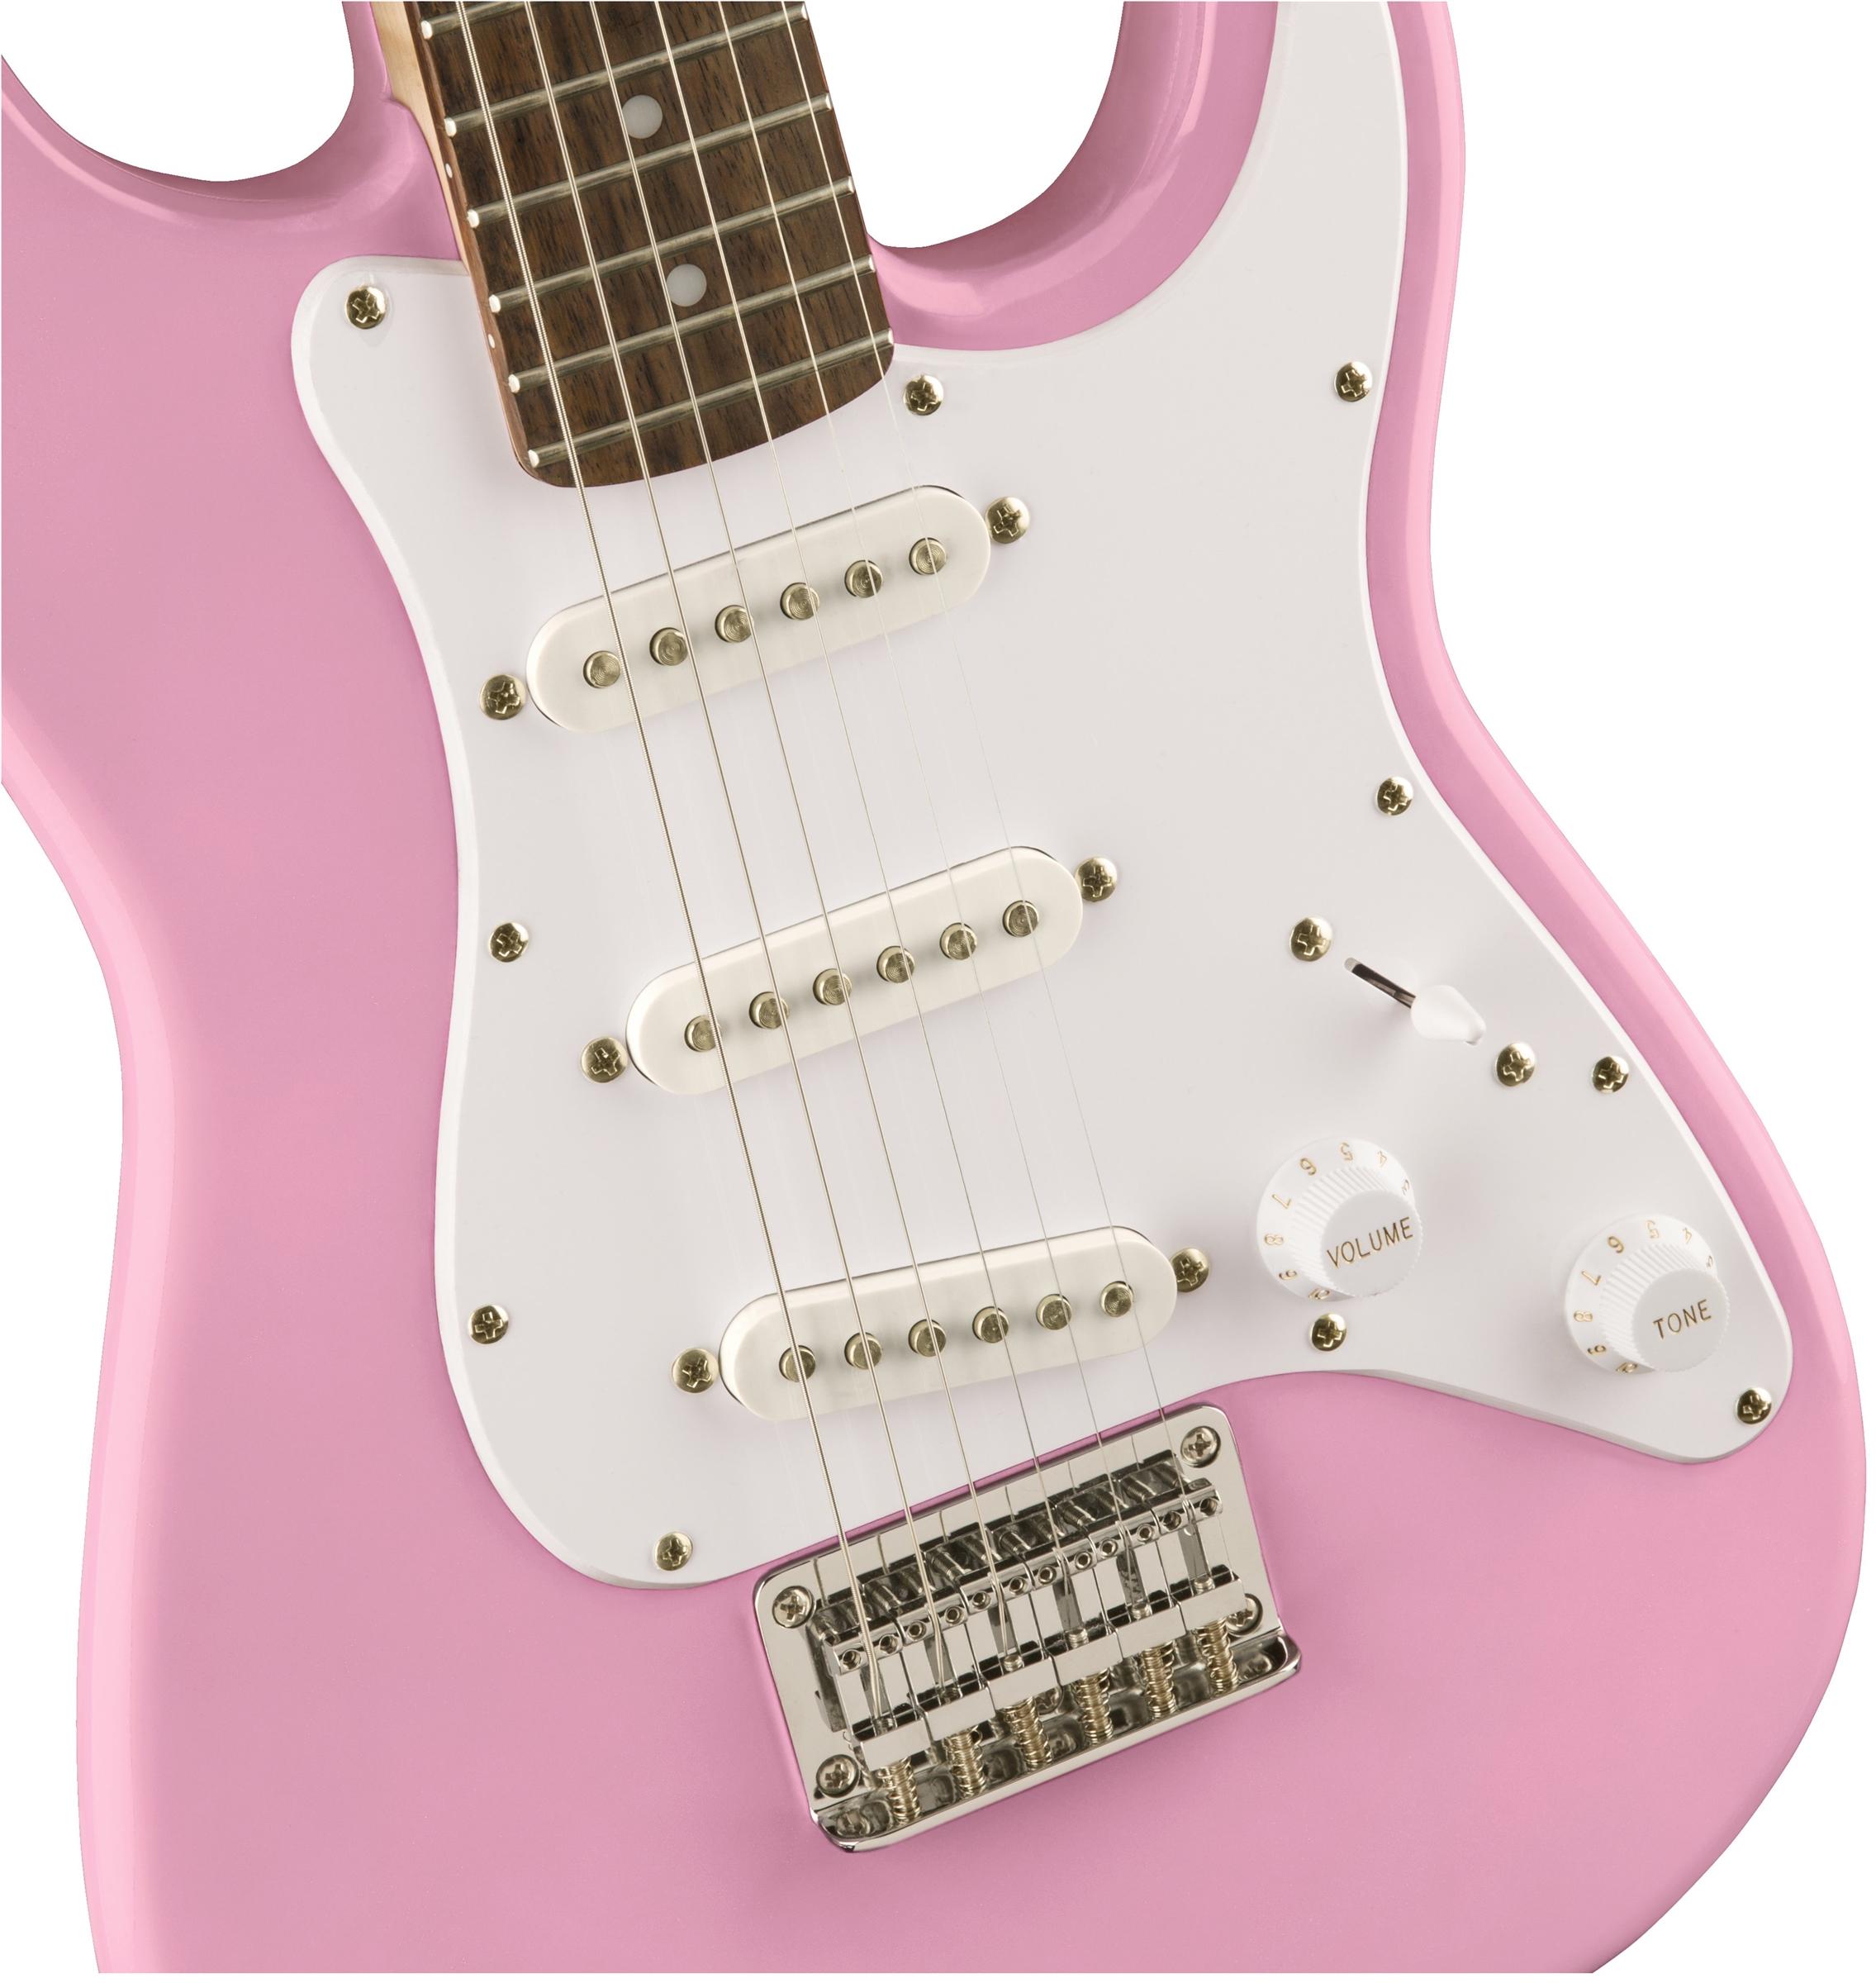 squier stratocaster wiring diagram starter wire mini strat electric guitars